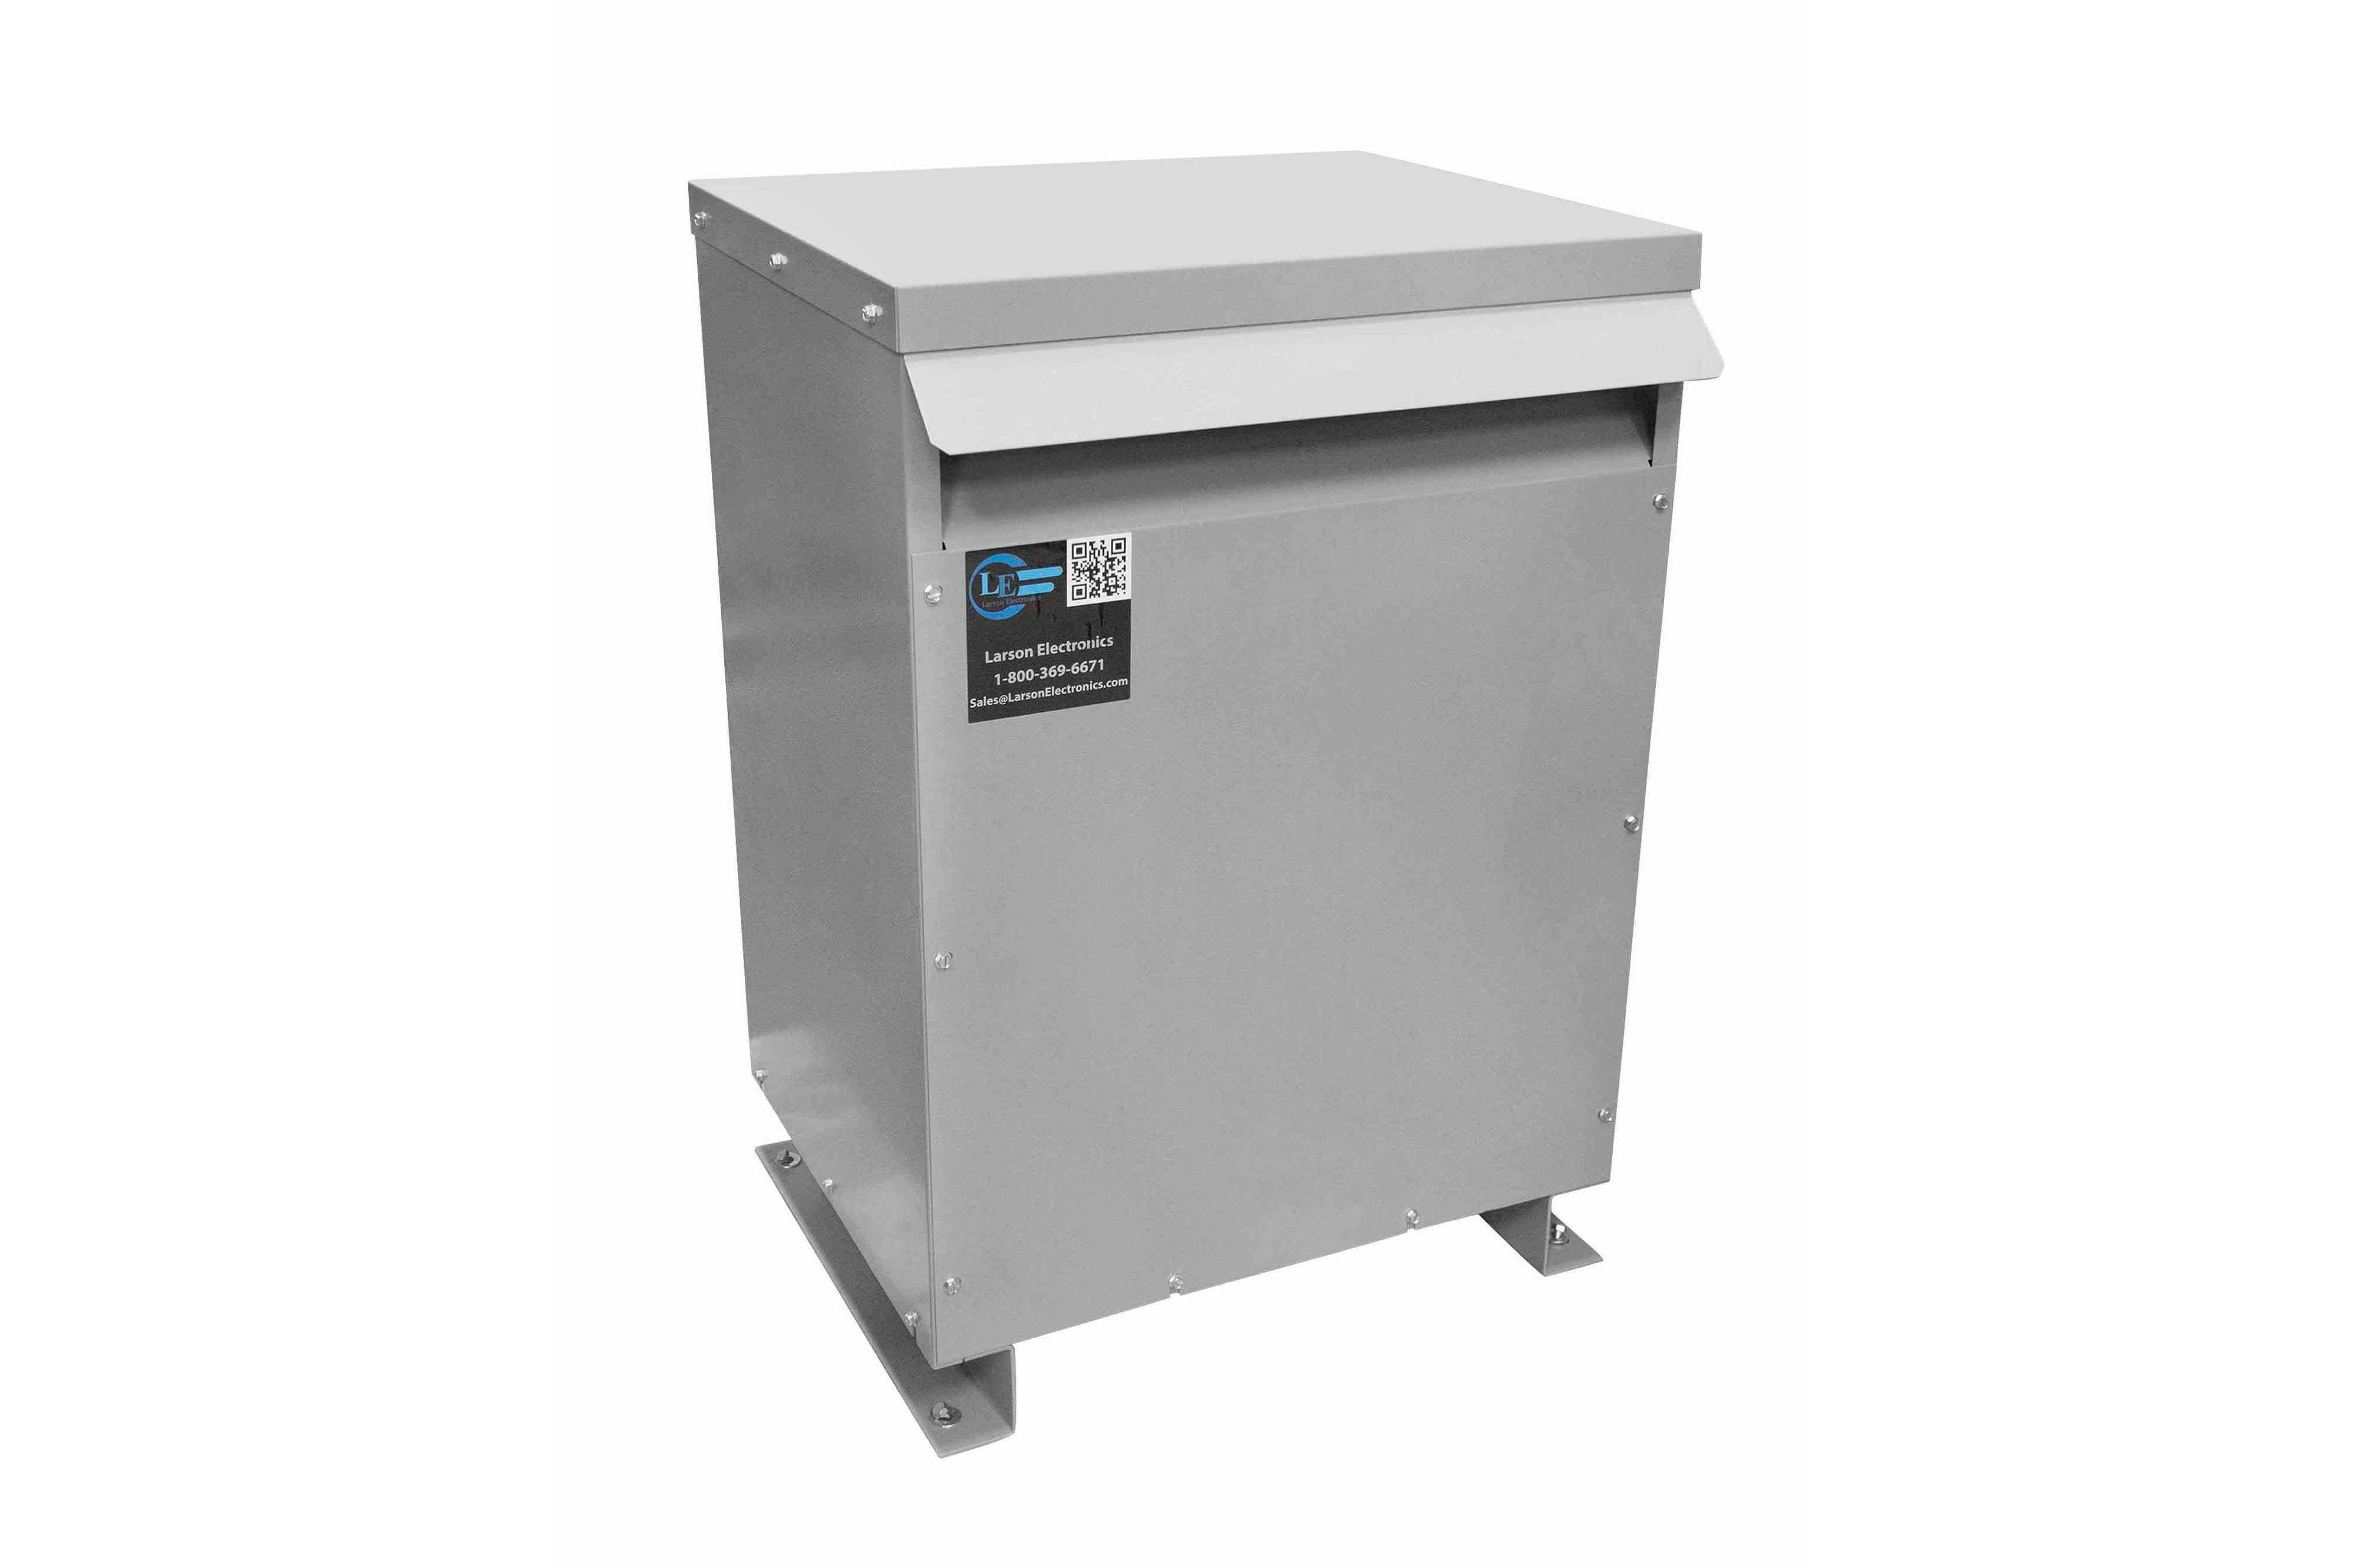 800 kVA 3PH Isolation Transformer, 240V Wye Primary, 400V Delta Secondary, N3R, Ventilated, 60 Hz